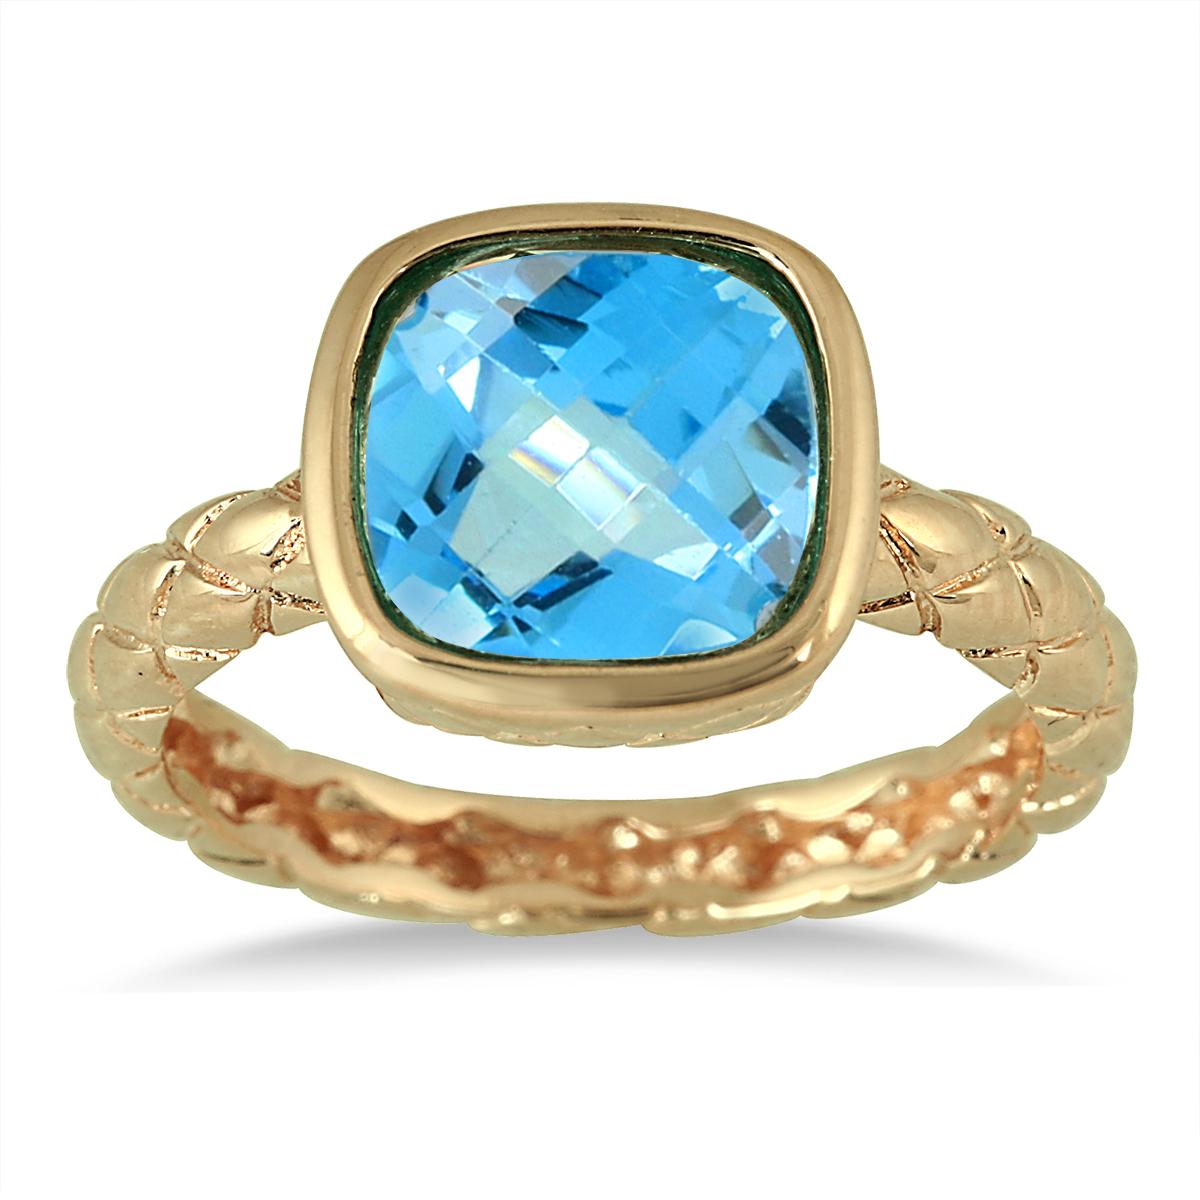 szul.com 3.00 Carat Cushion Cut Blue Topaz ring in 18K Gold Plated Brass at Sears.com